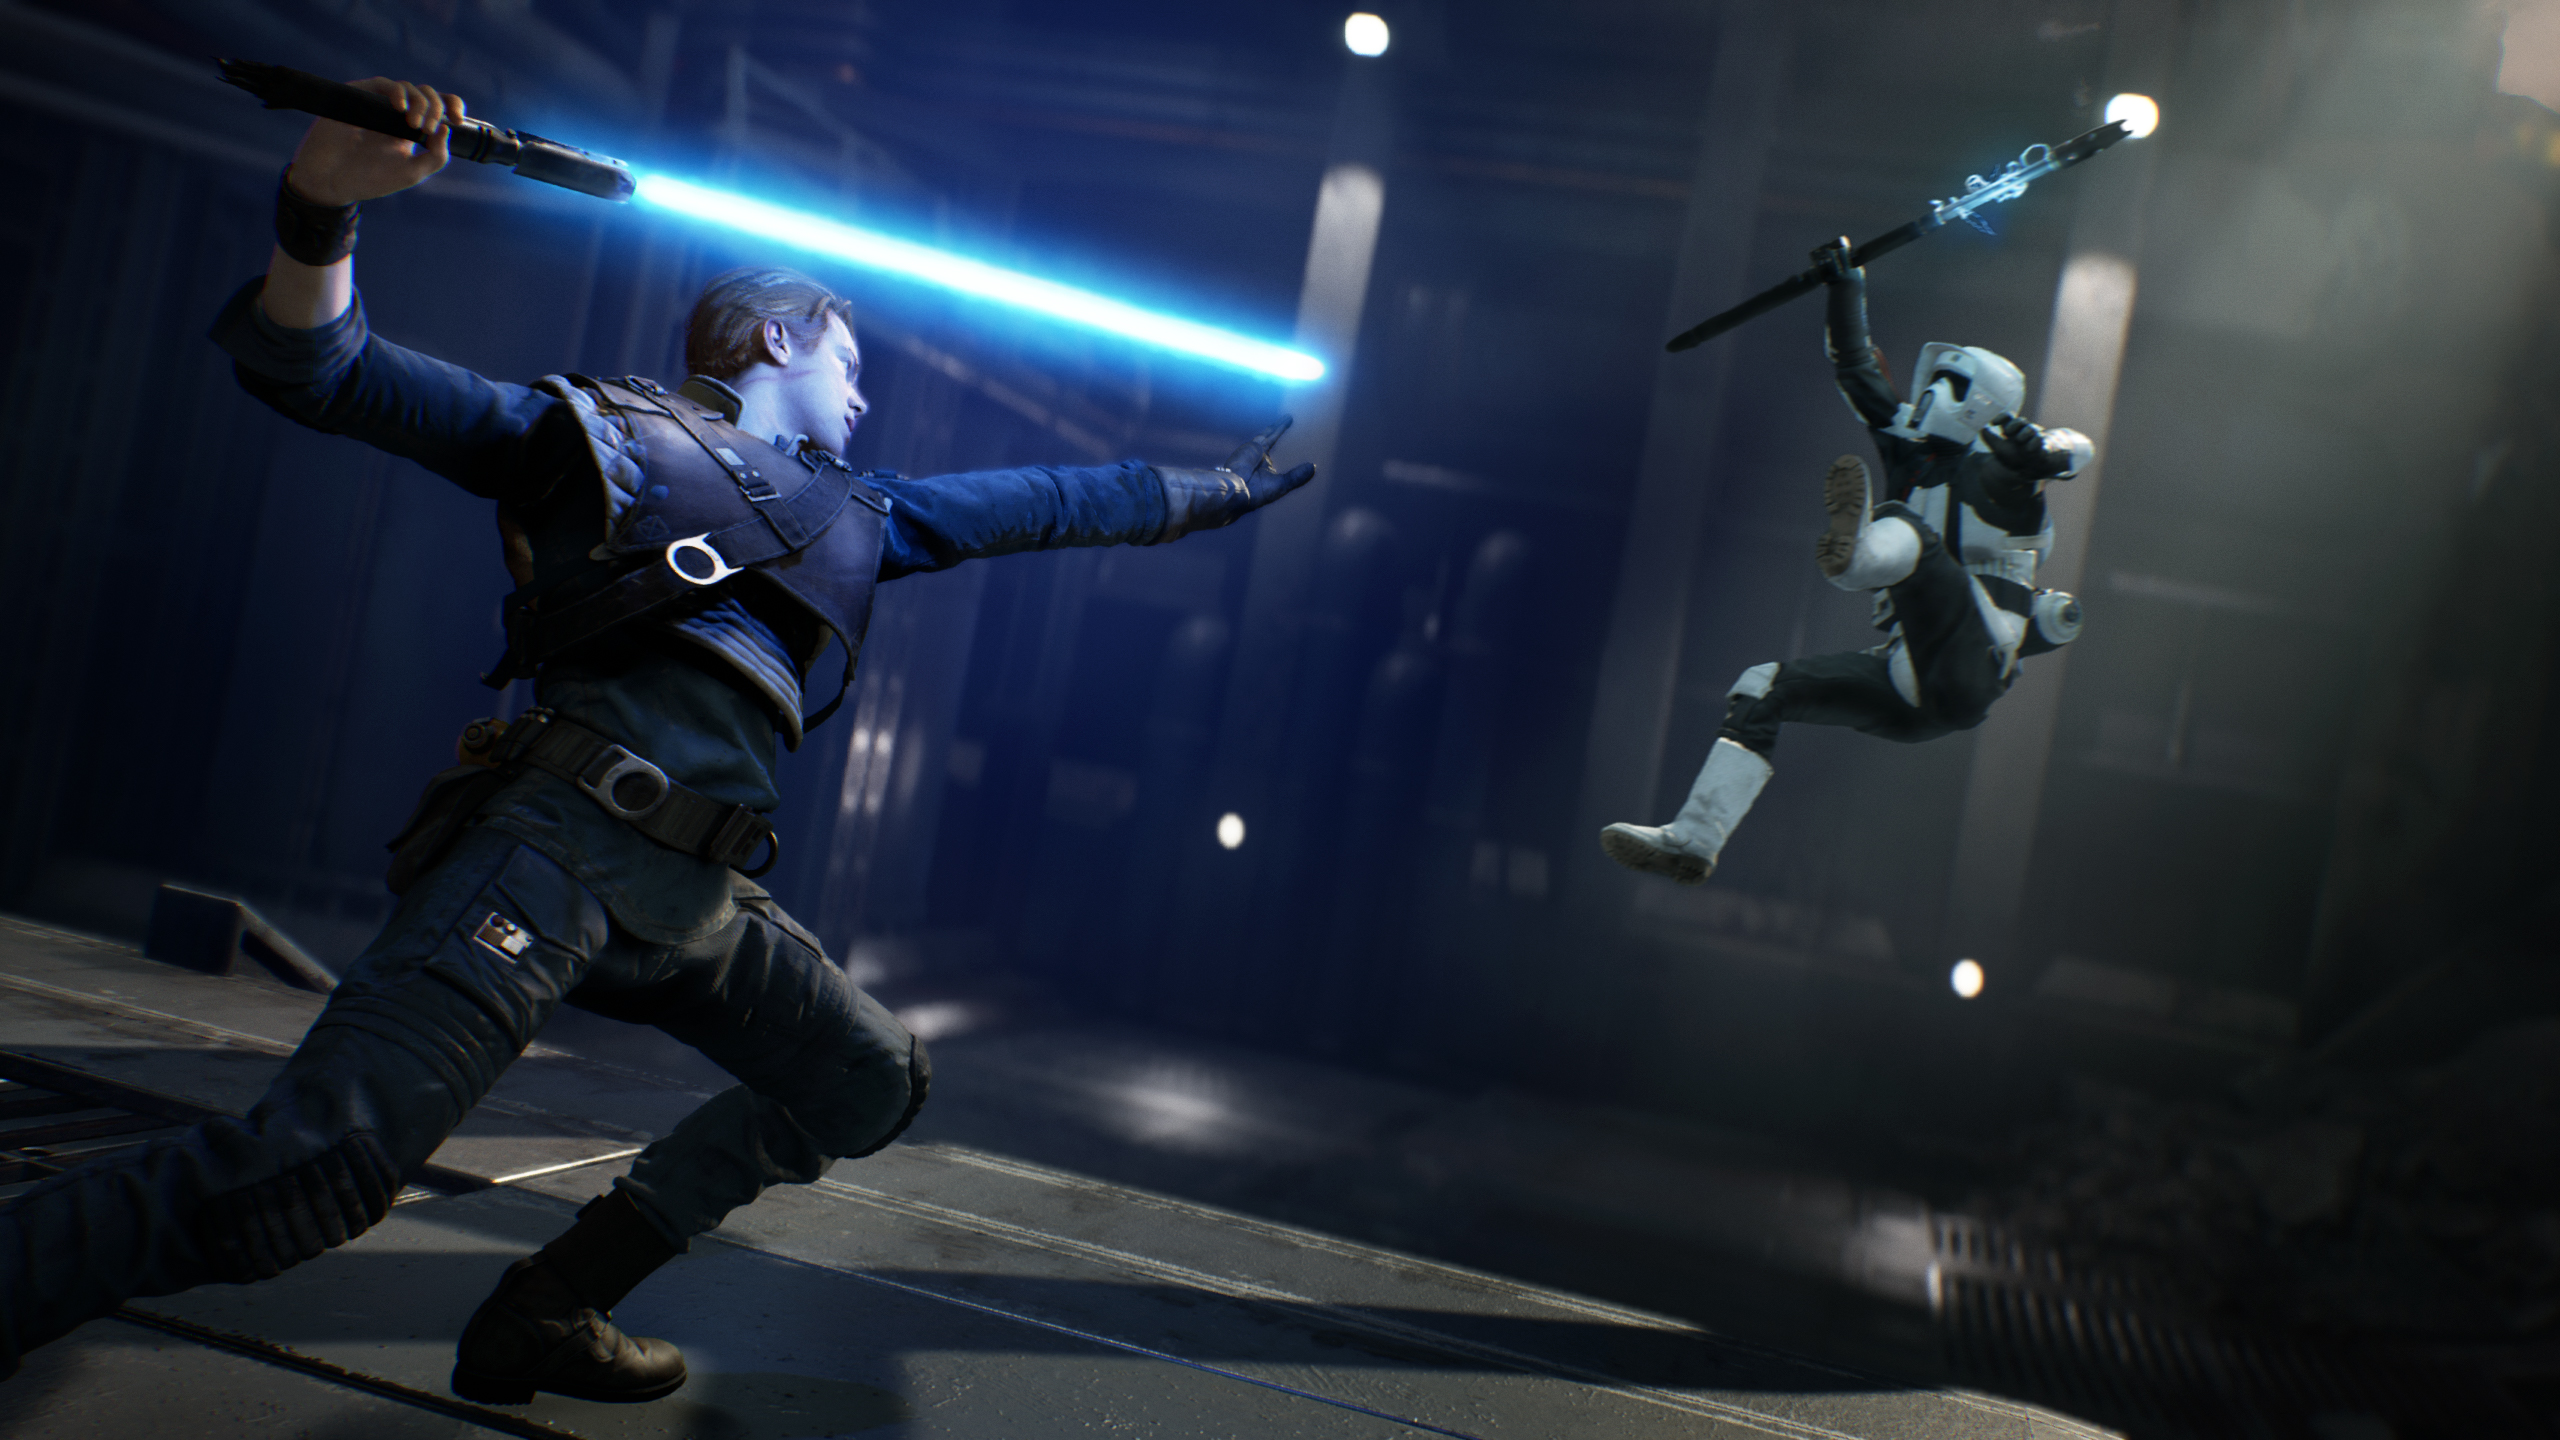 Star Wars Jedi Fallen Order Hd Wallpaper Background Image 2560x1440